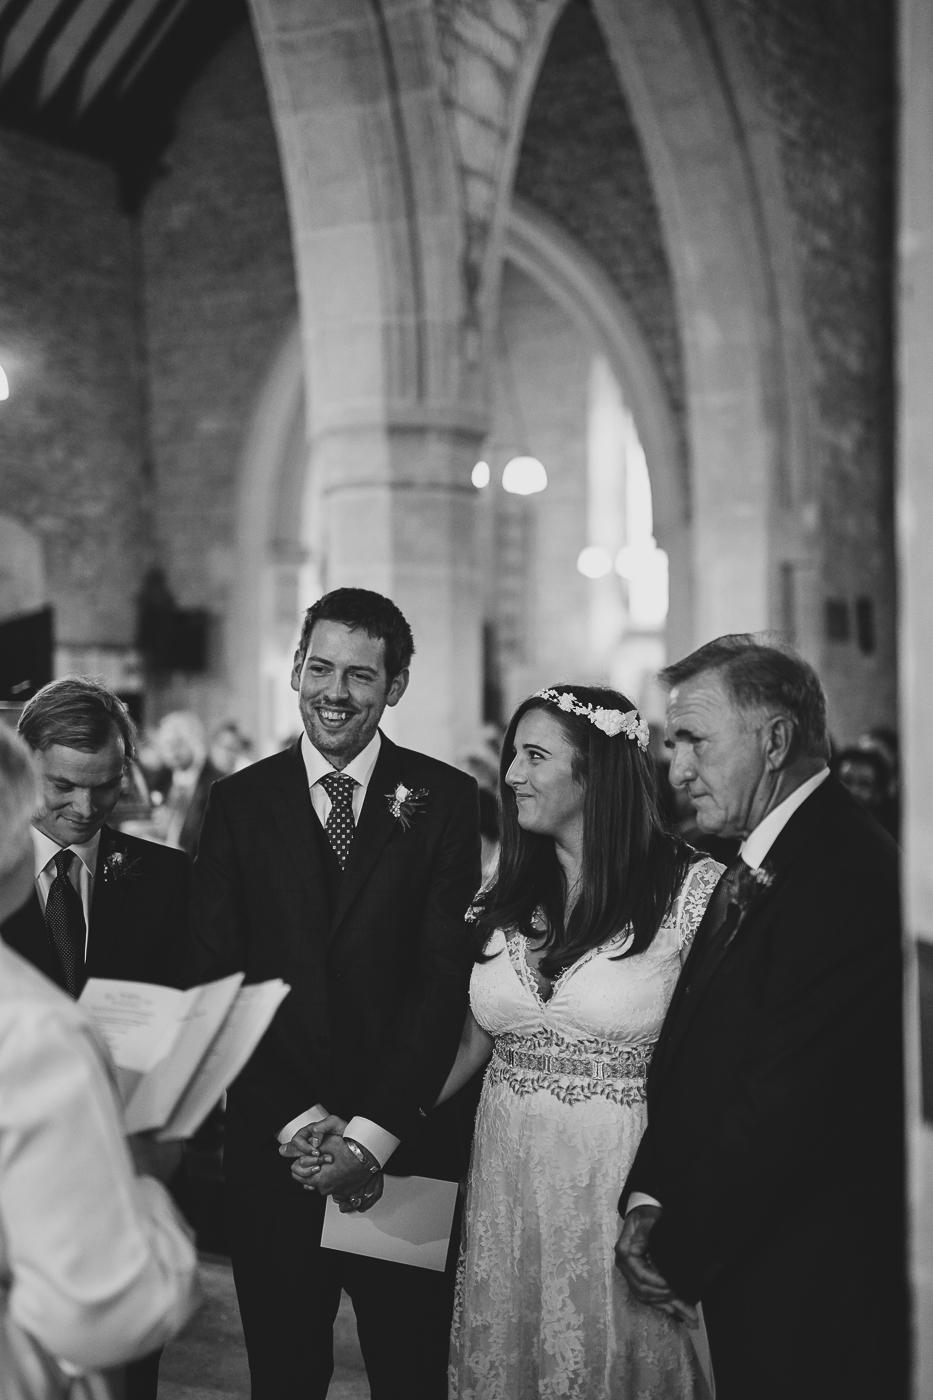 Danni_And_Jack_Gloucester_Wedding-69.jpg